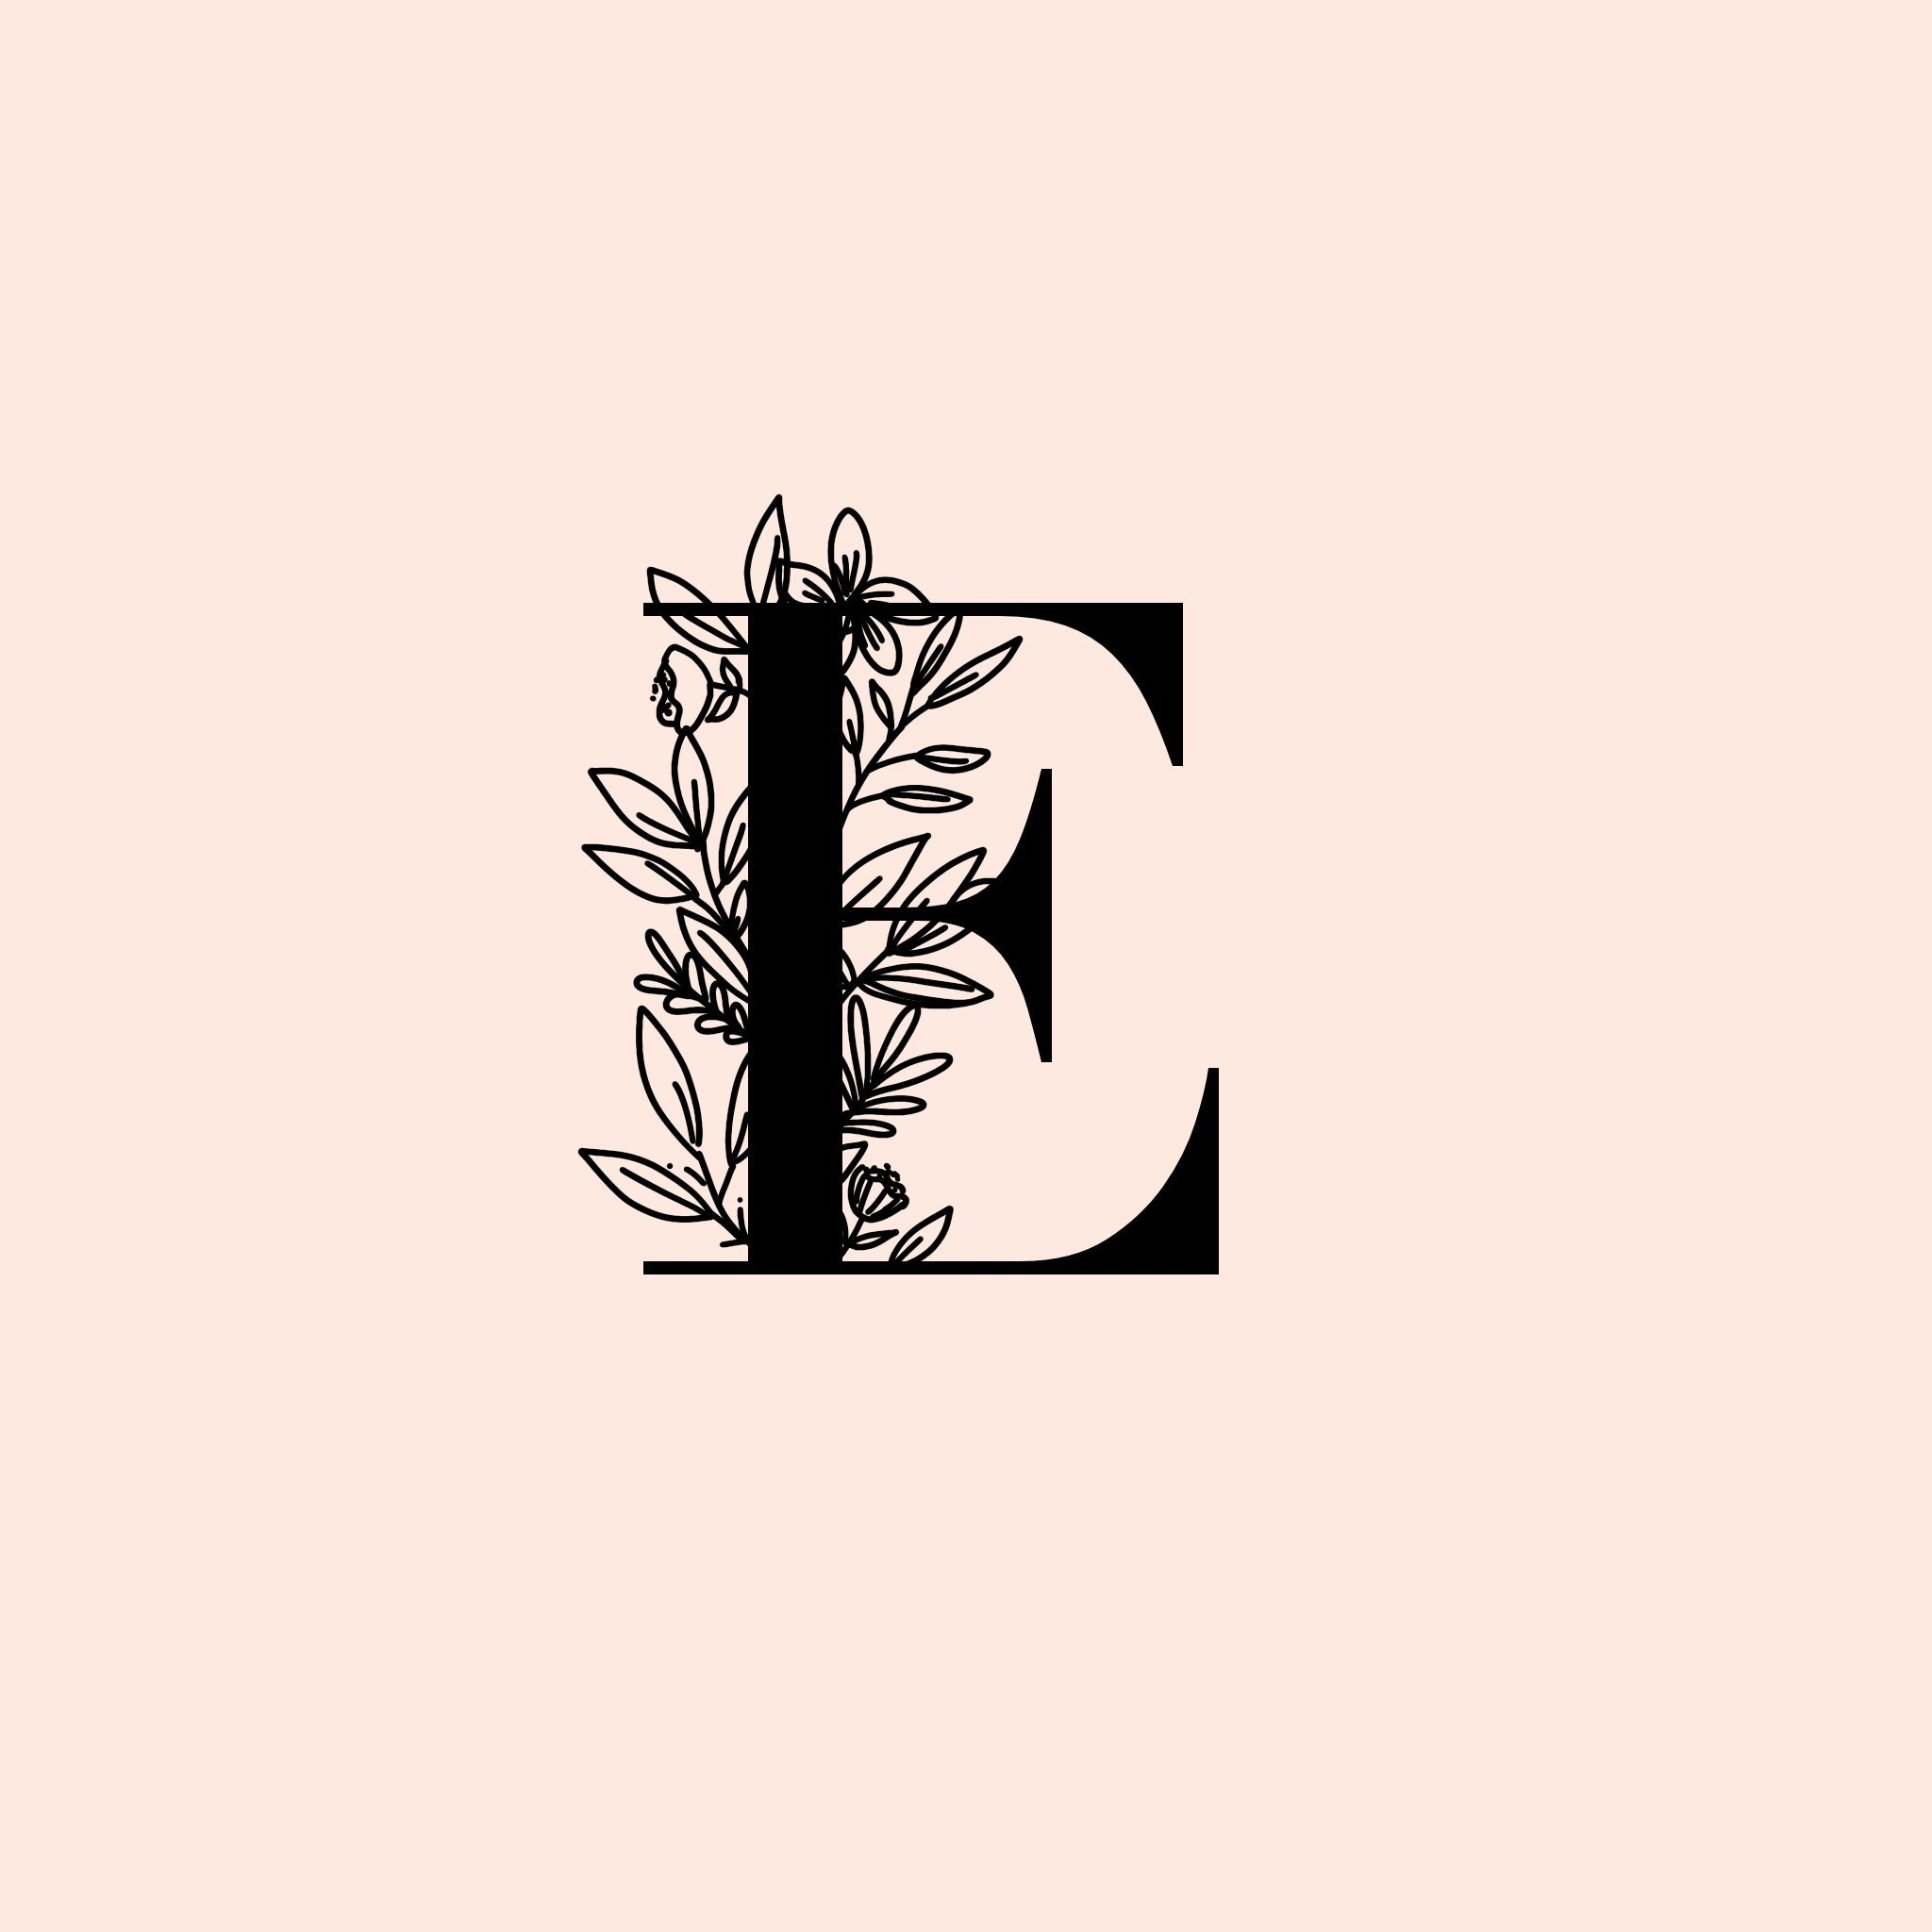 Letra E Letter E Calligraphy Modern Calligraphy Procreate Lettering Lettering Wallpaper Ipad Harfleme Arkaplan Tasarimlari Resim Duvari